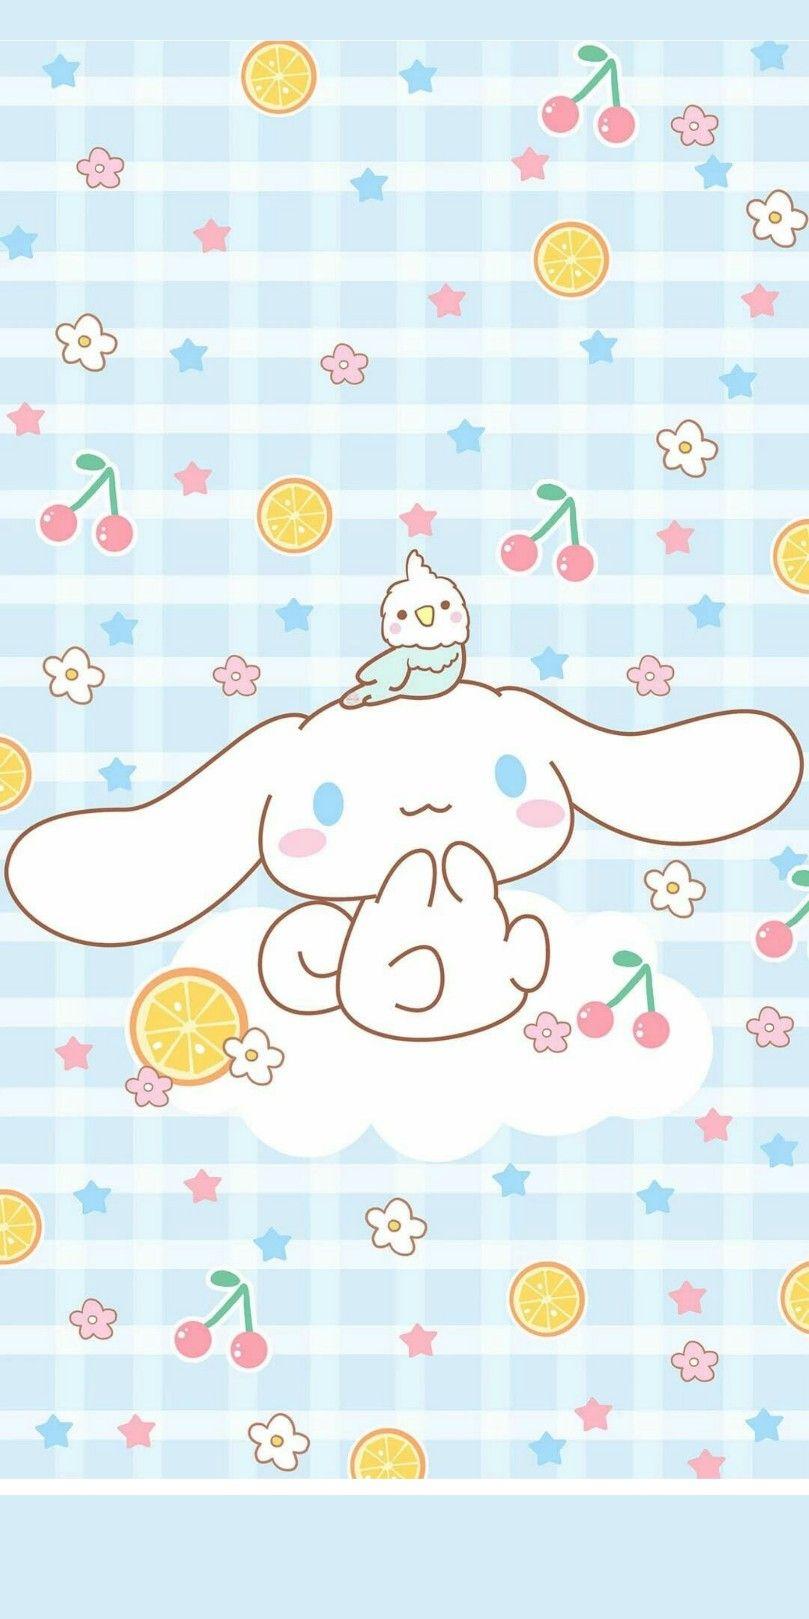 Aesthetic Character Hello Kitty Wallpaper Aesthetic